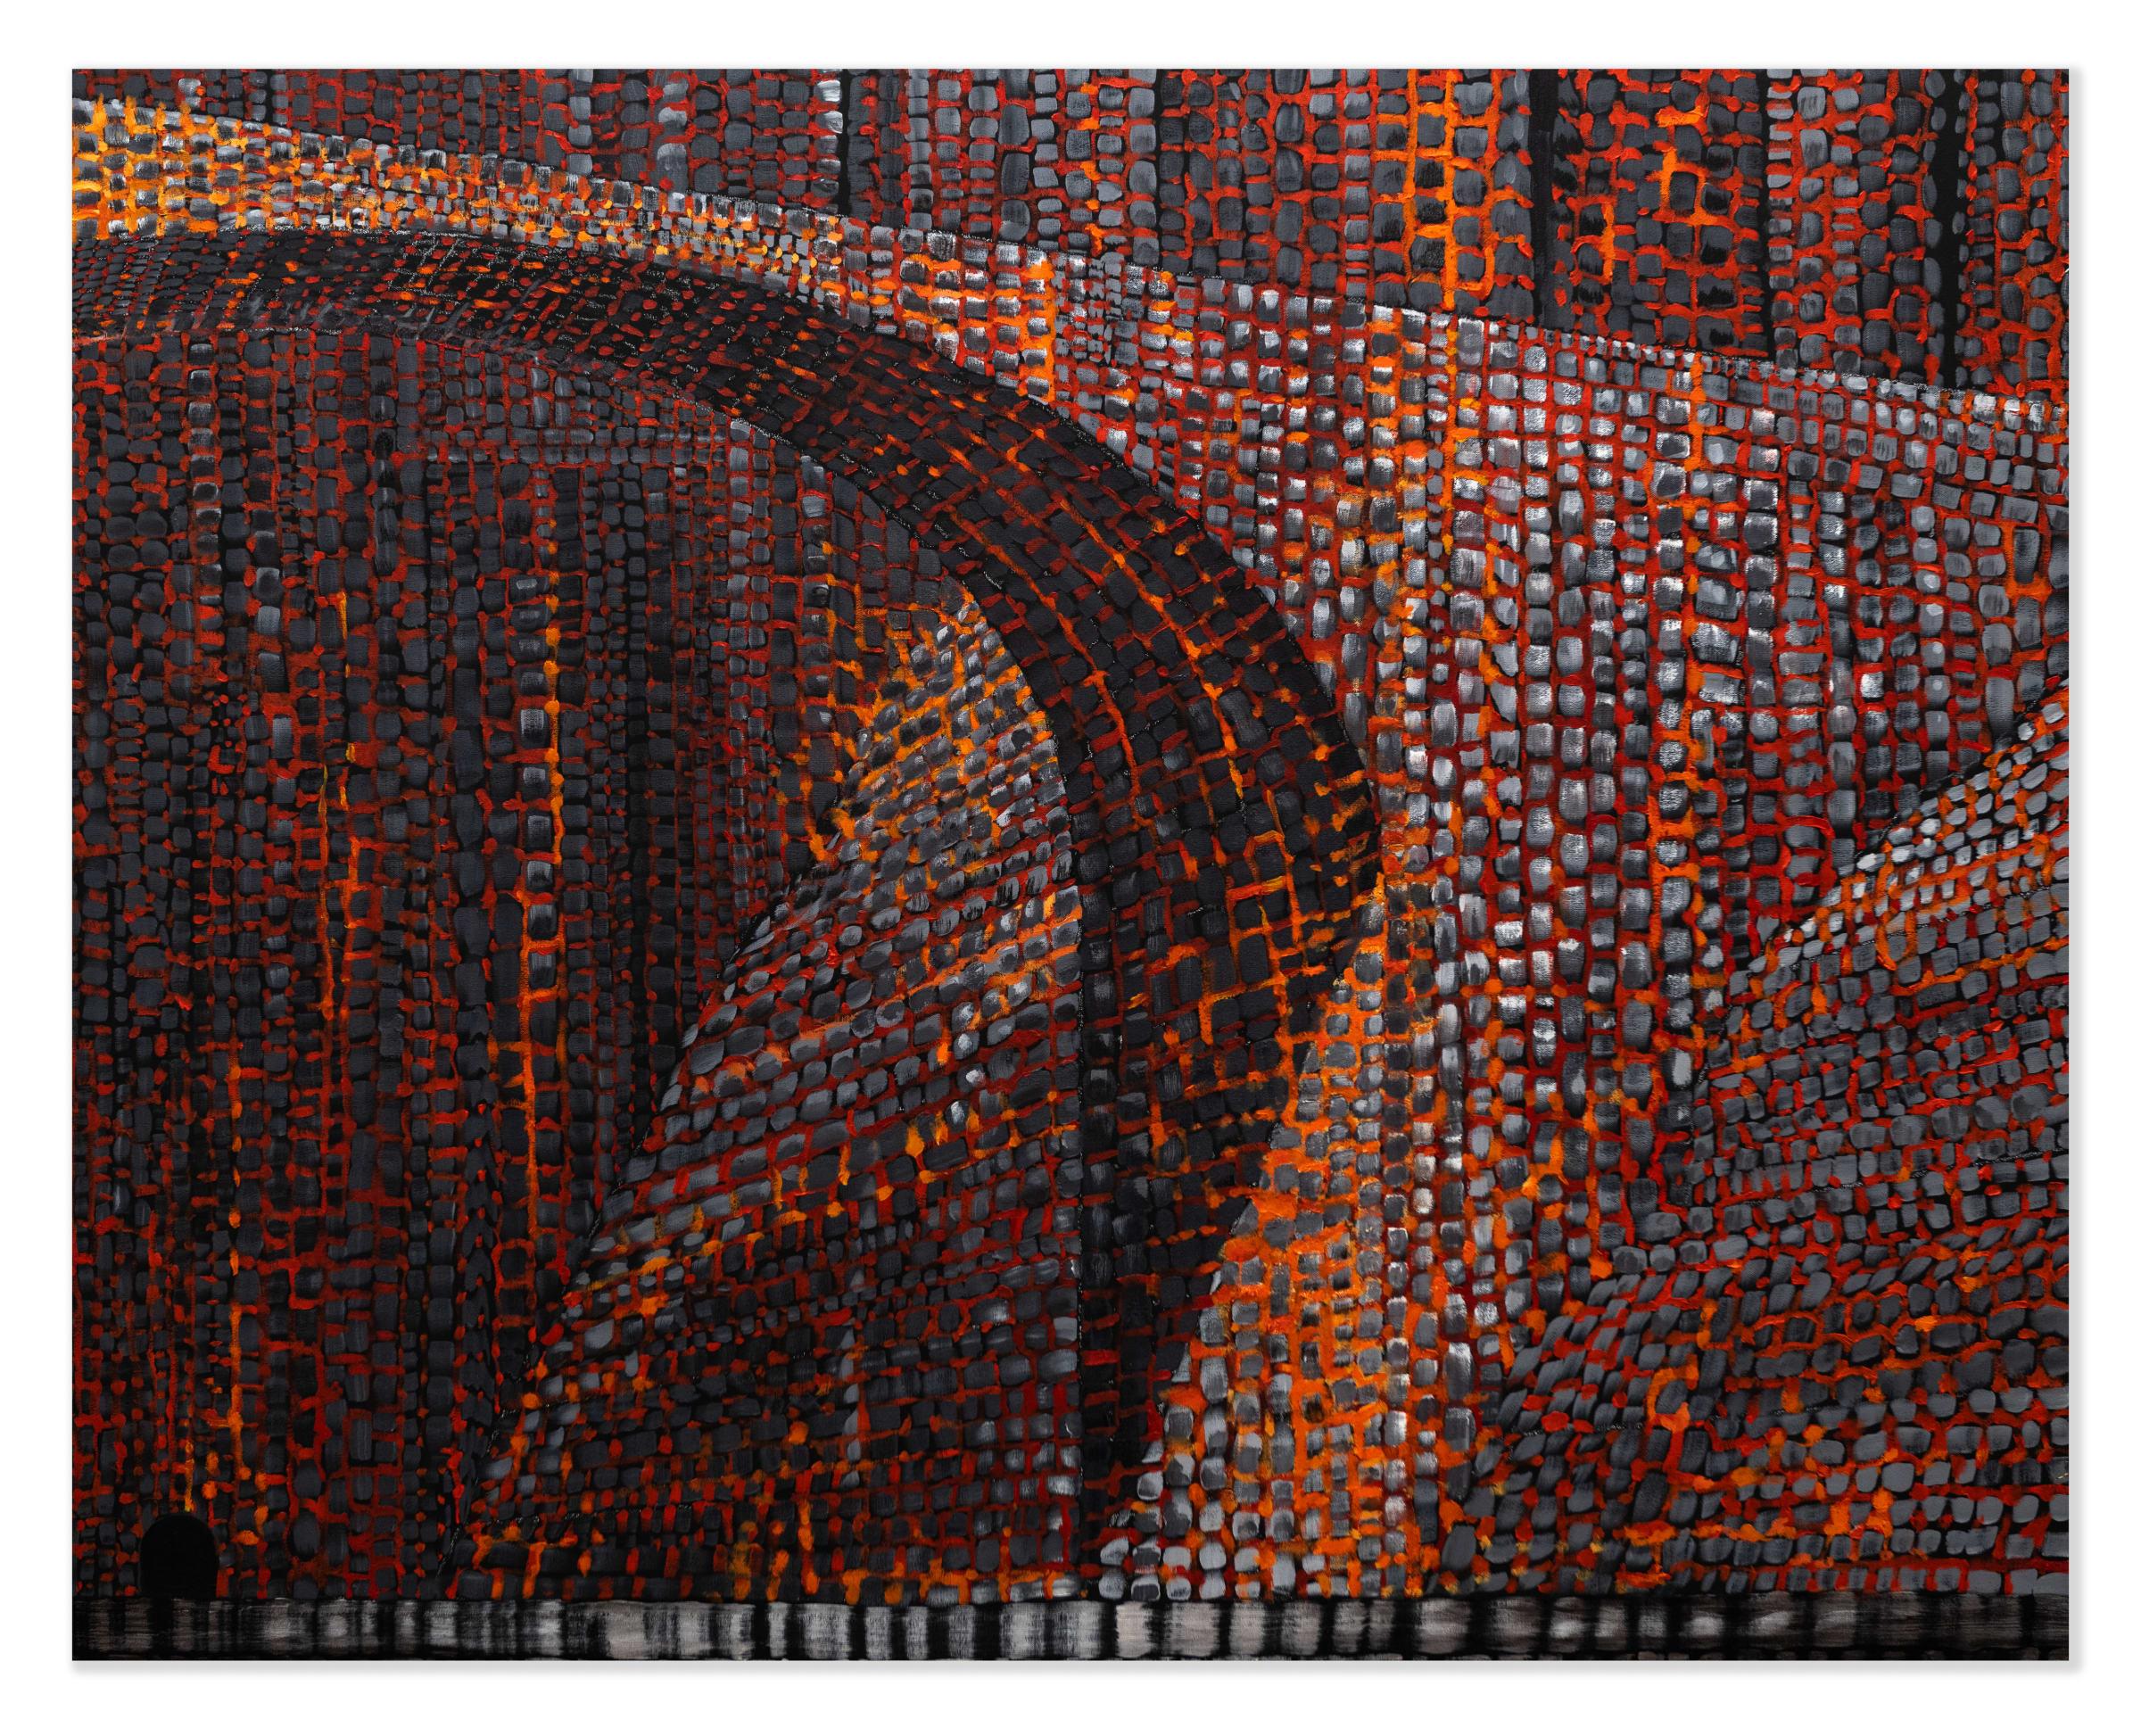 "<span class=""link fancybox-details-link""><a href=""/artists/51-derek-cowie/works/8723-derek-cowie-bridge-1-2020-21/"">View Detail Page</a></span><div class=""artist""><strong>Derek Cowie</strong></div> <div class=""title""><em>Bridge #1</em>, 2020-21</div> <div class=""signed_and_dated"">Signed, titled and dated on verso</div> <div class=""medium"">Oil on canvas</div> <div class=""dimensions"">1220mm x 1520mm</div>"